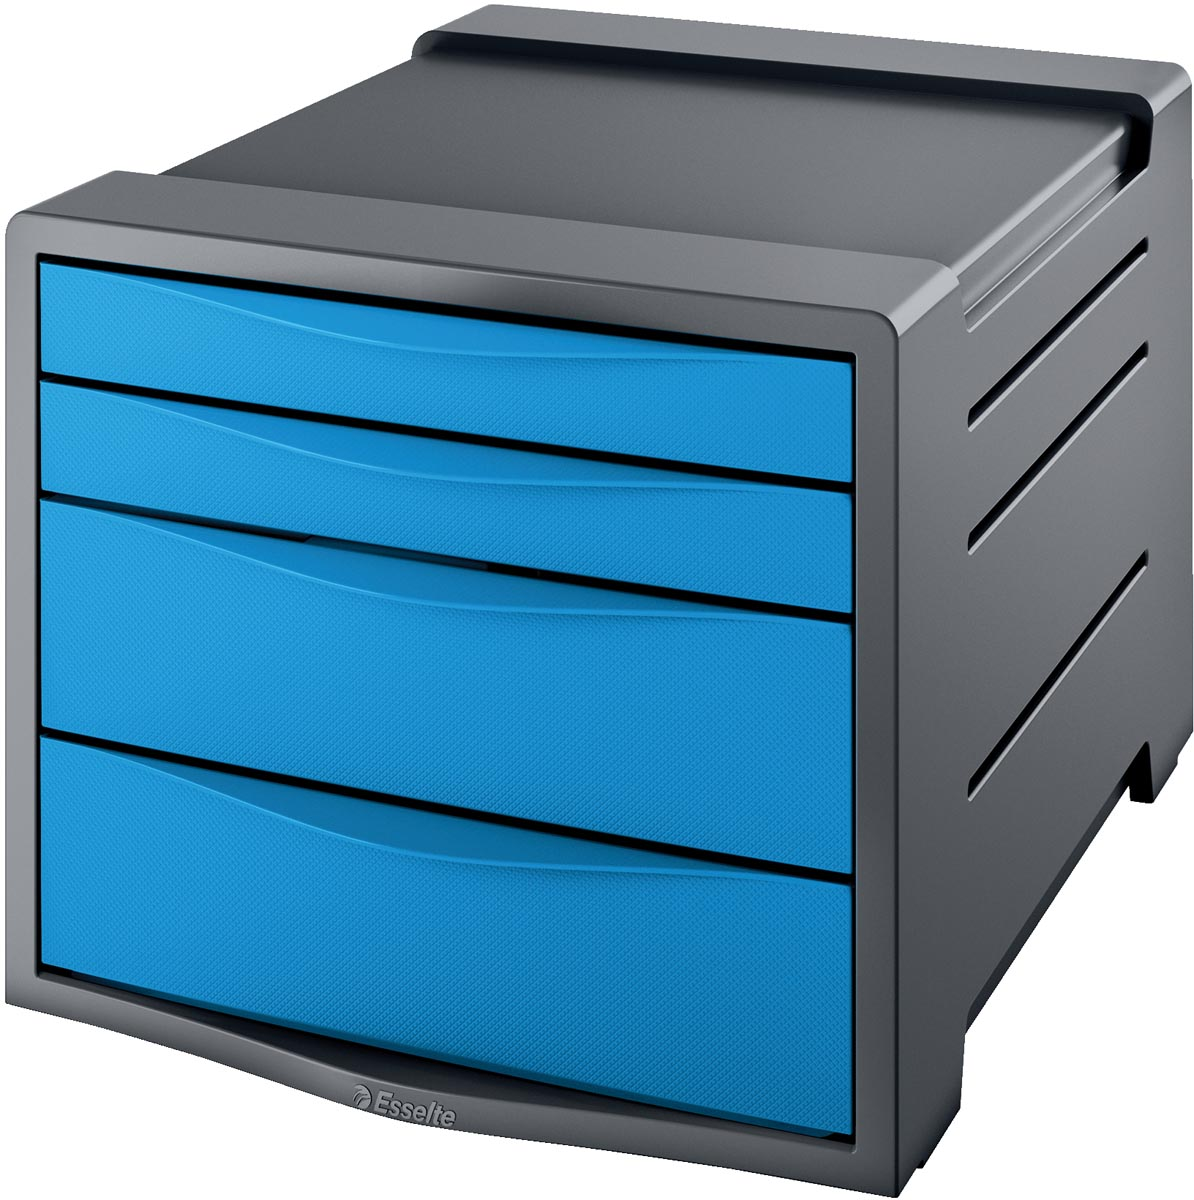 Ladenbox Esselte Vivida 4 laden blauw